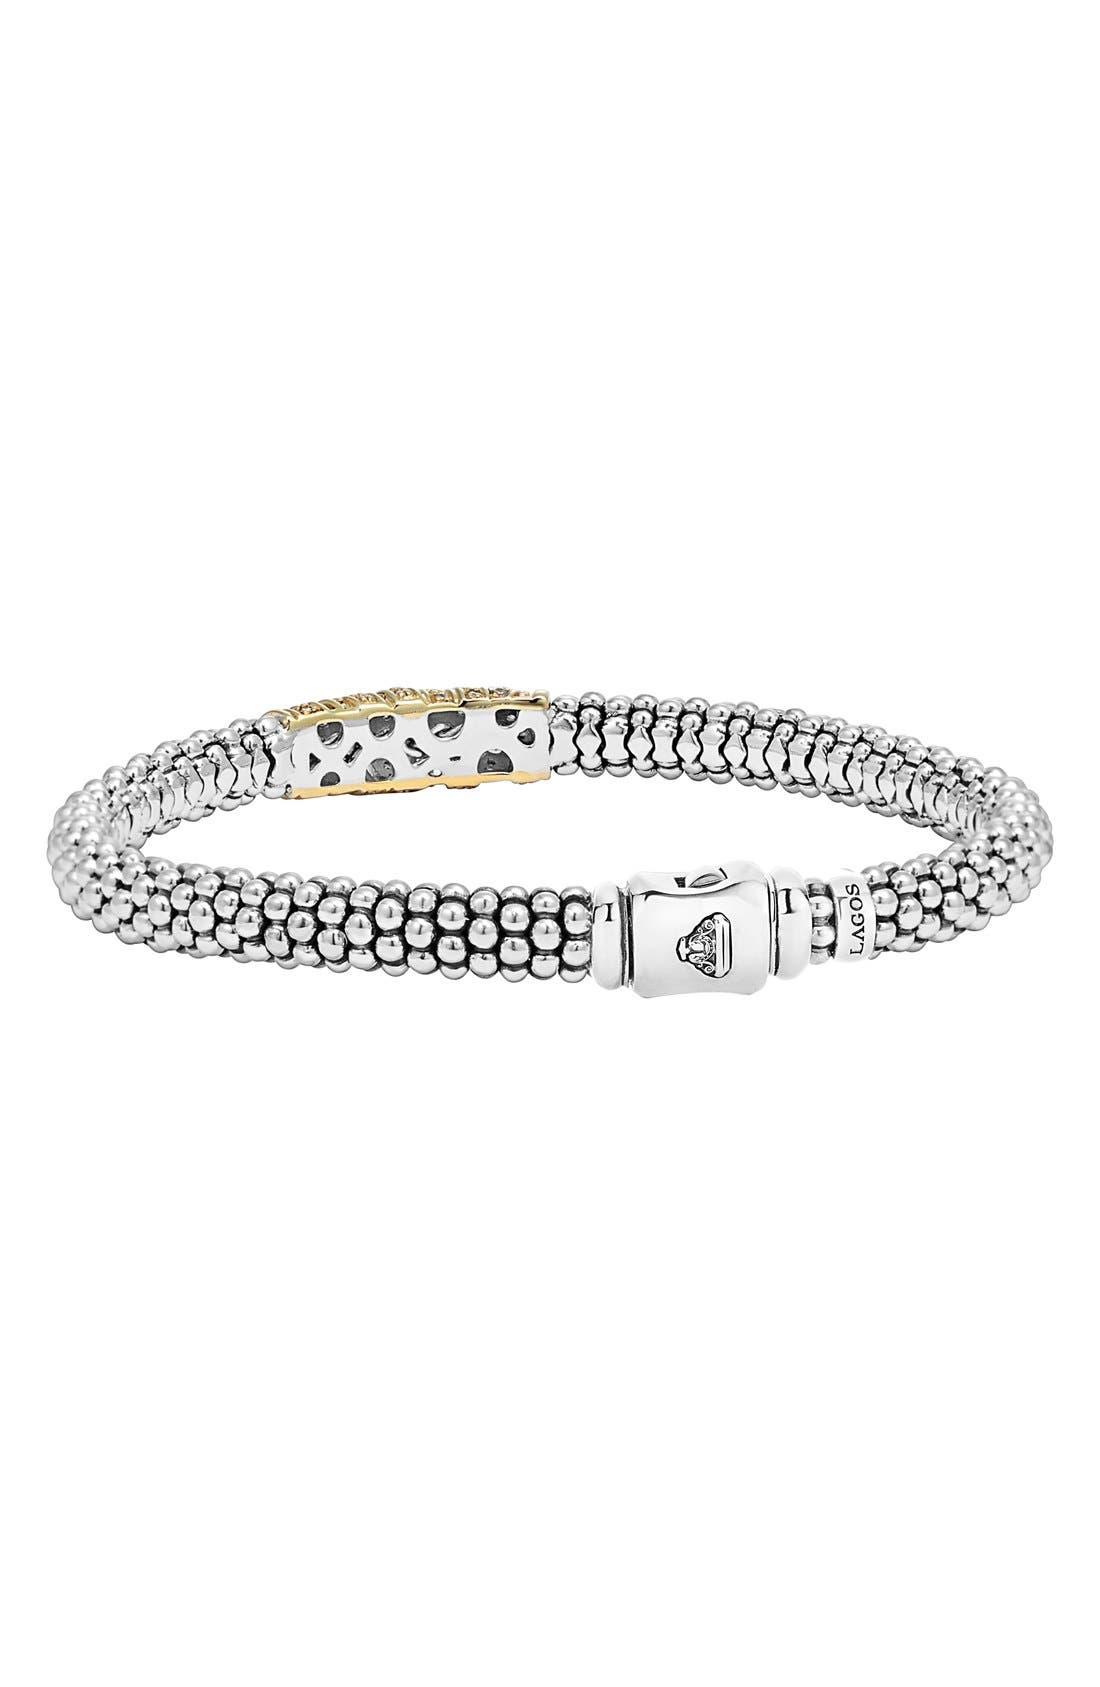 'Diamonds & Caviar' Diamond Bracelet,                             Alternate thumbnail 2, color,                             Sterling Silver/ Gold